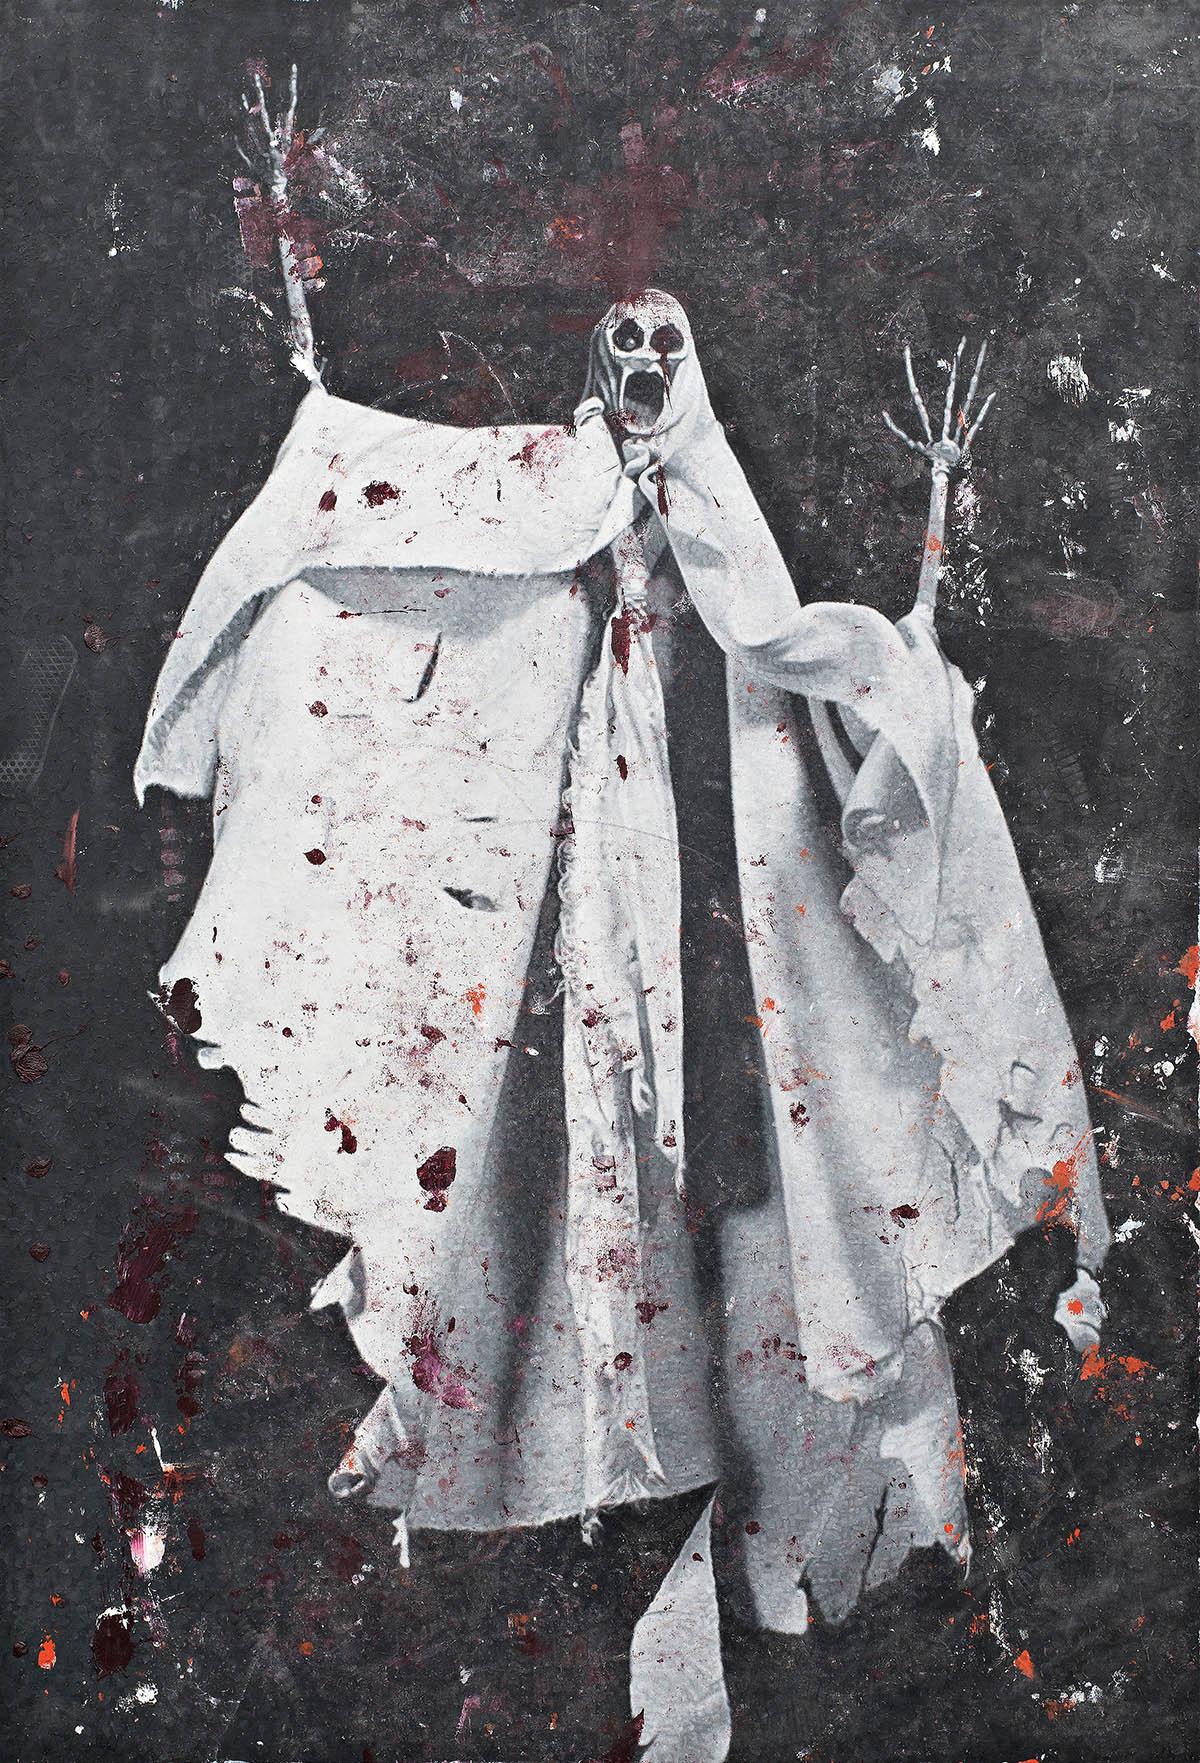 Rudolf Stingel, Untitled, 2015